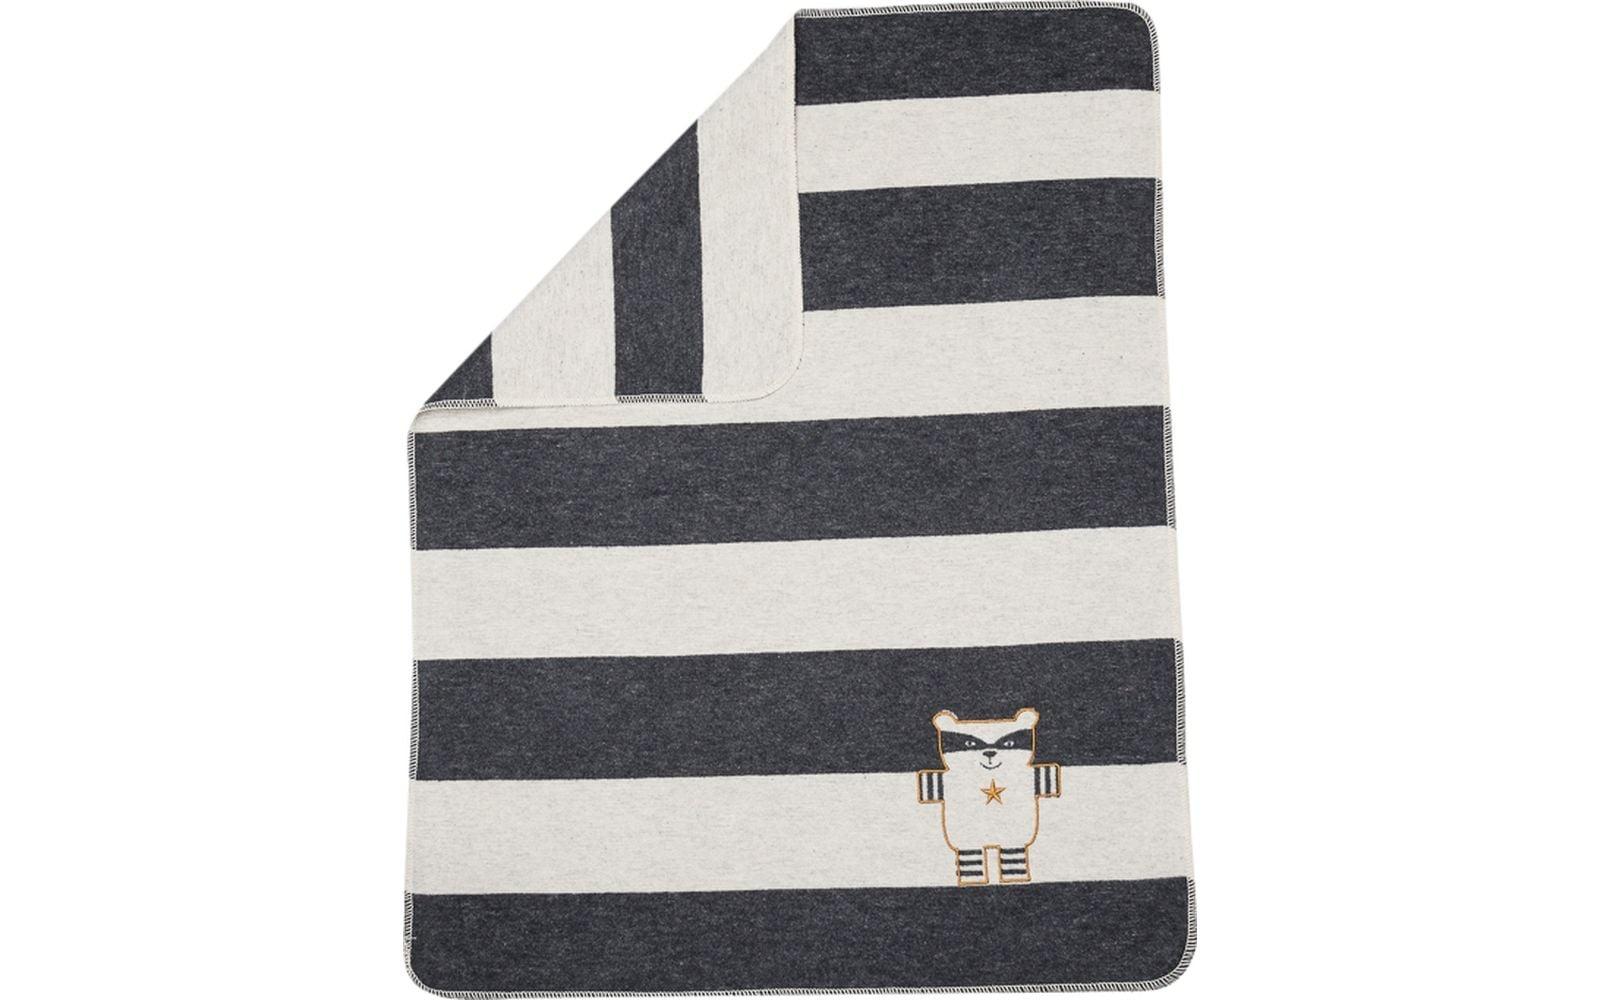 Blanket - Racoon - Charcoal Stripe-2